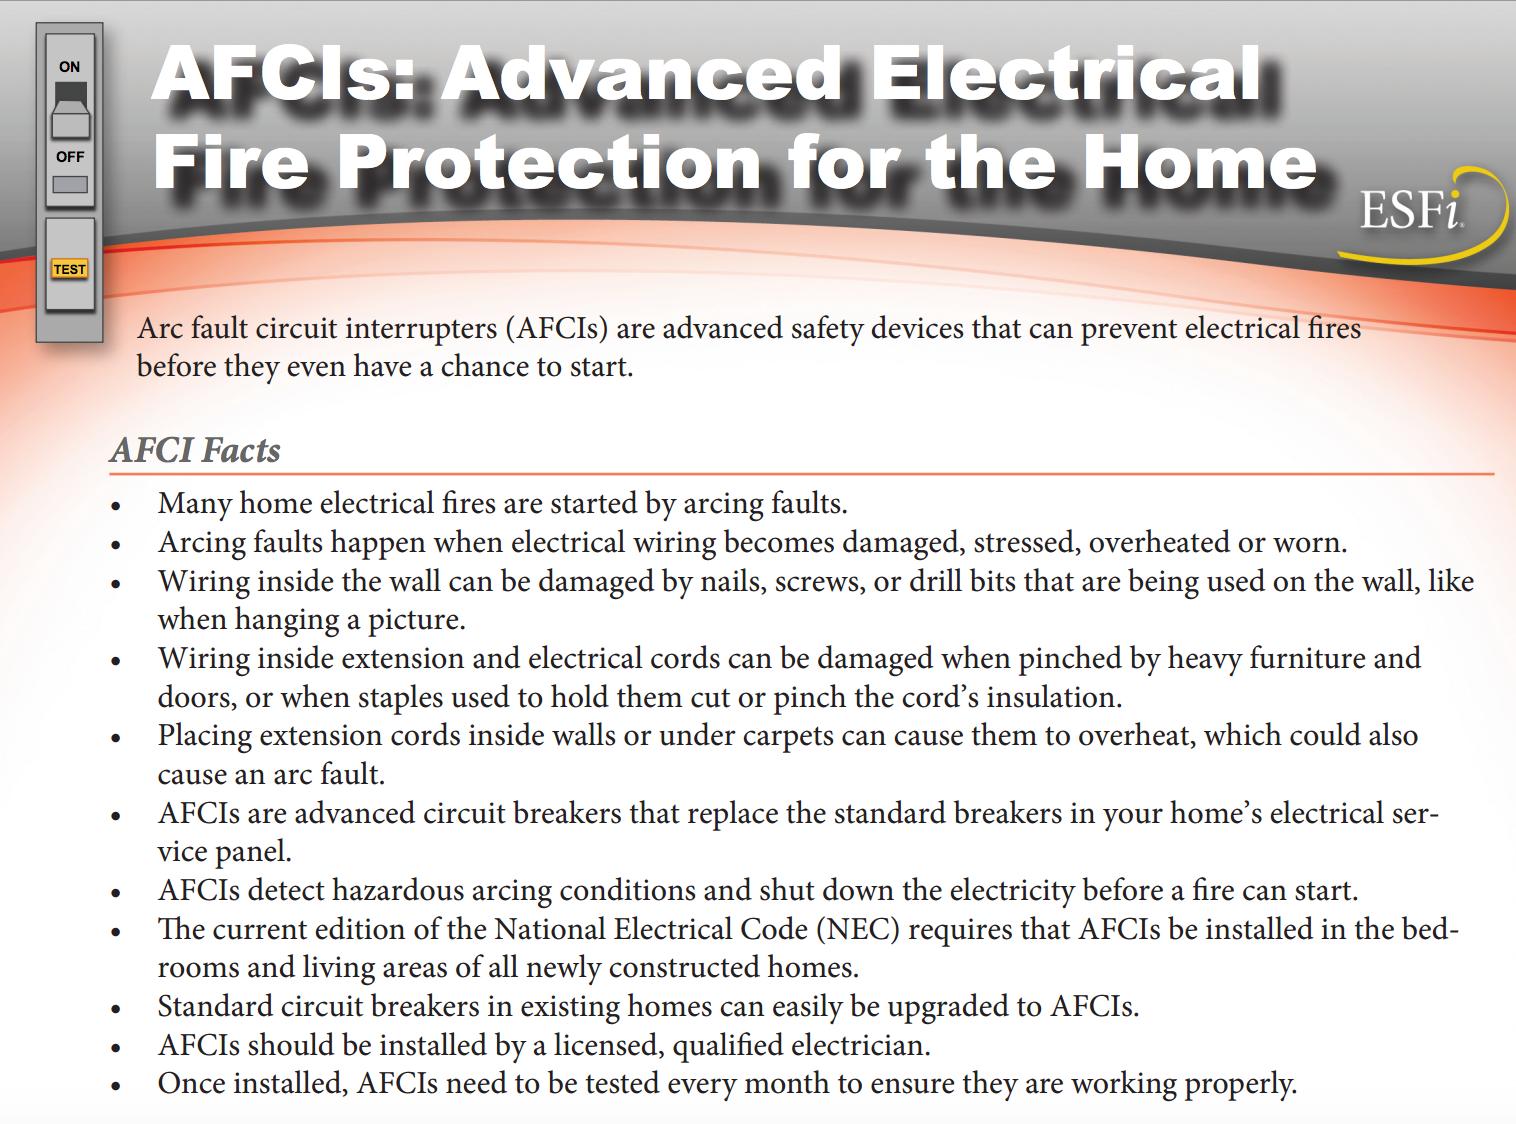 afci - arc fault interrupter facts